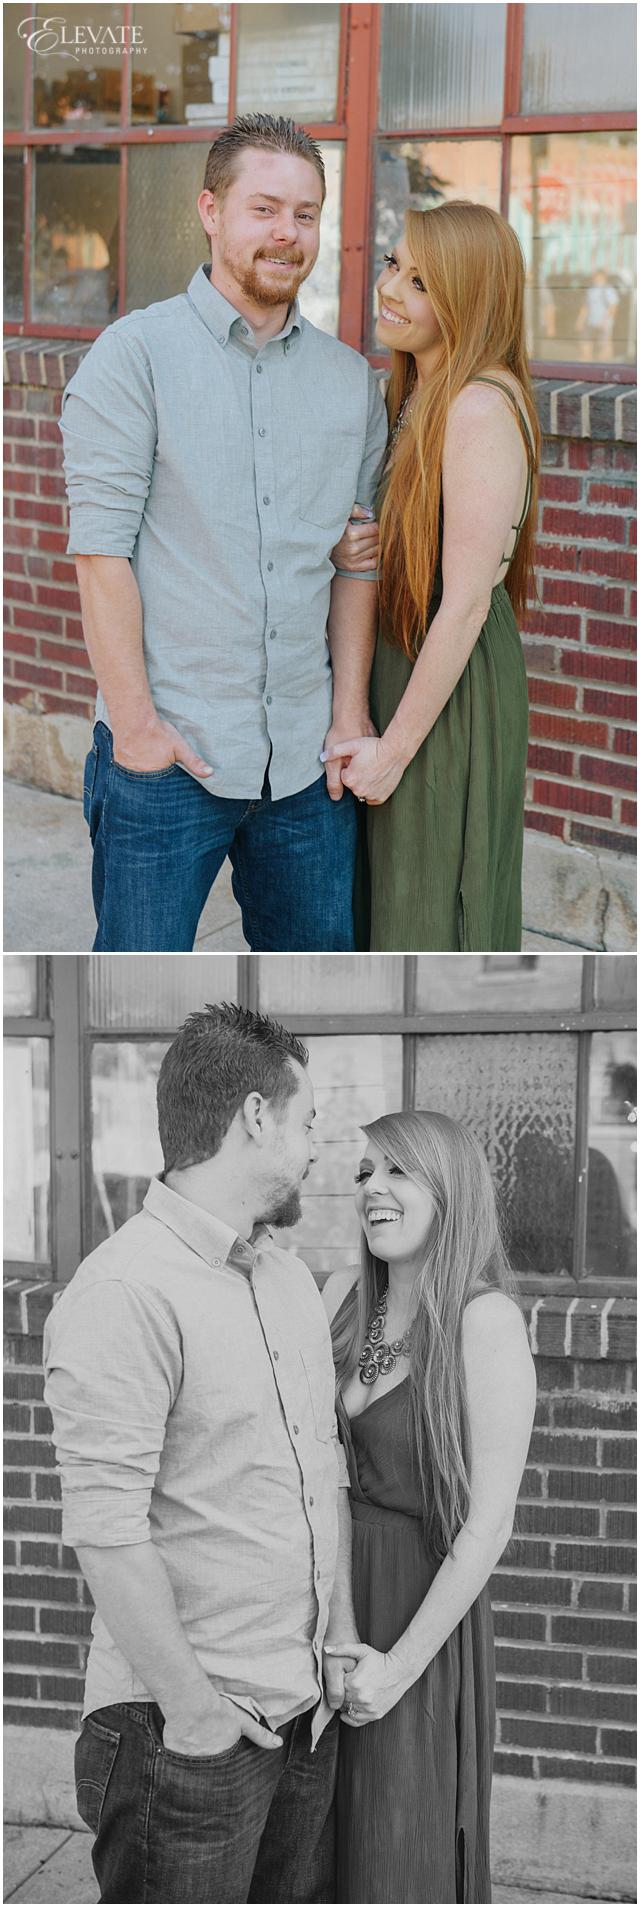 Donelle-Cory-Engagement-Photos_0004